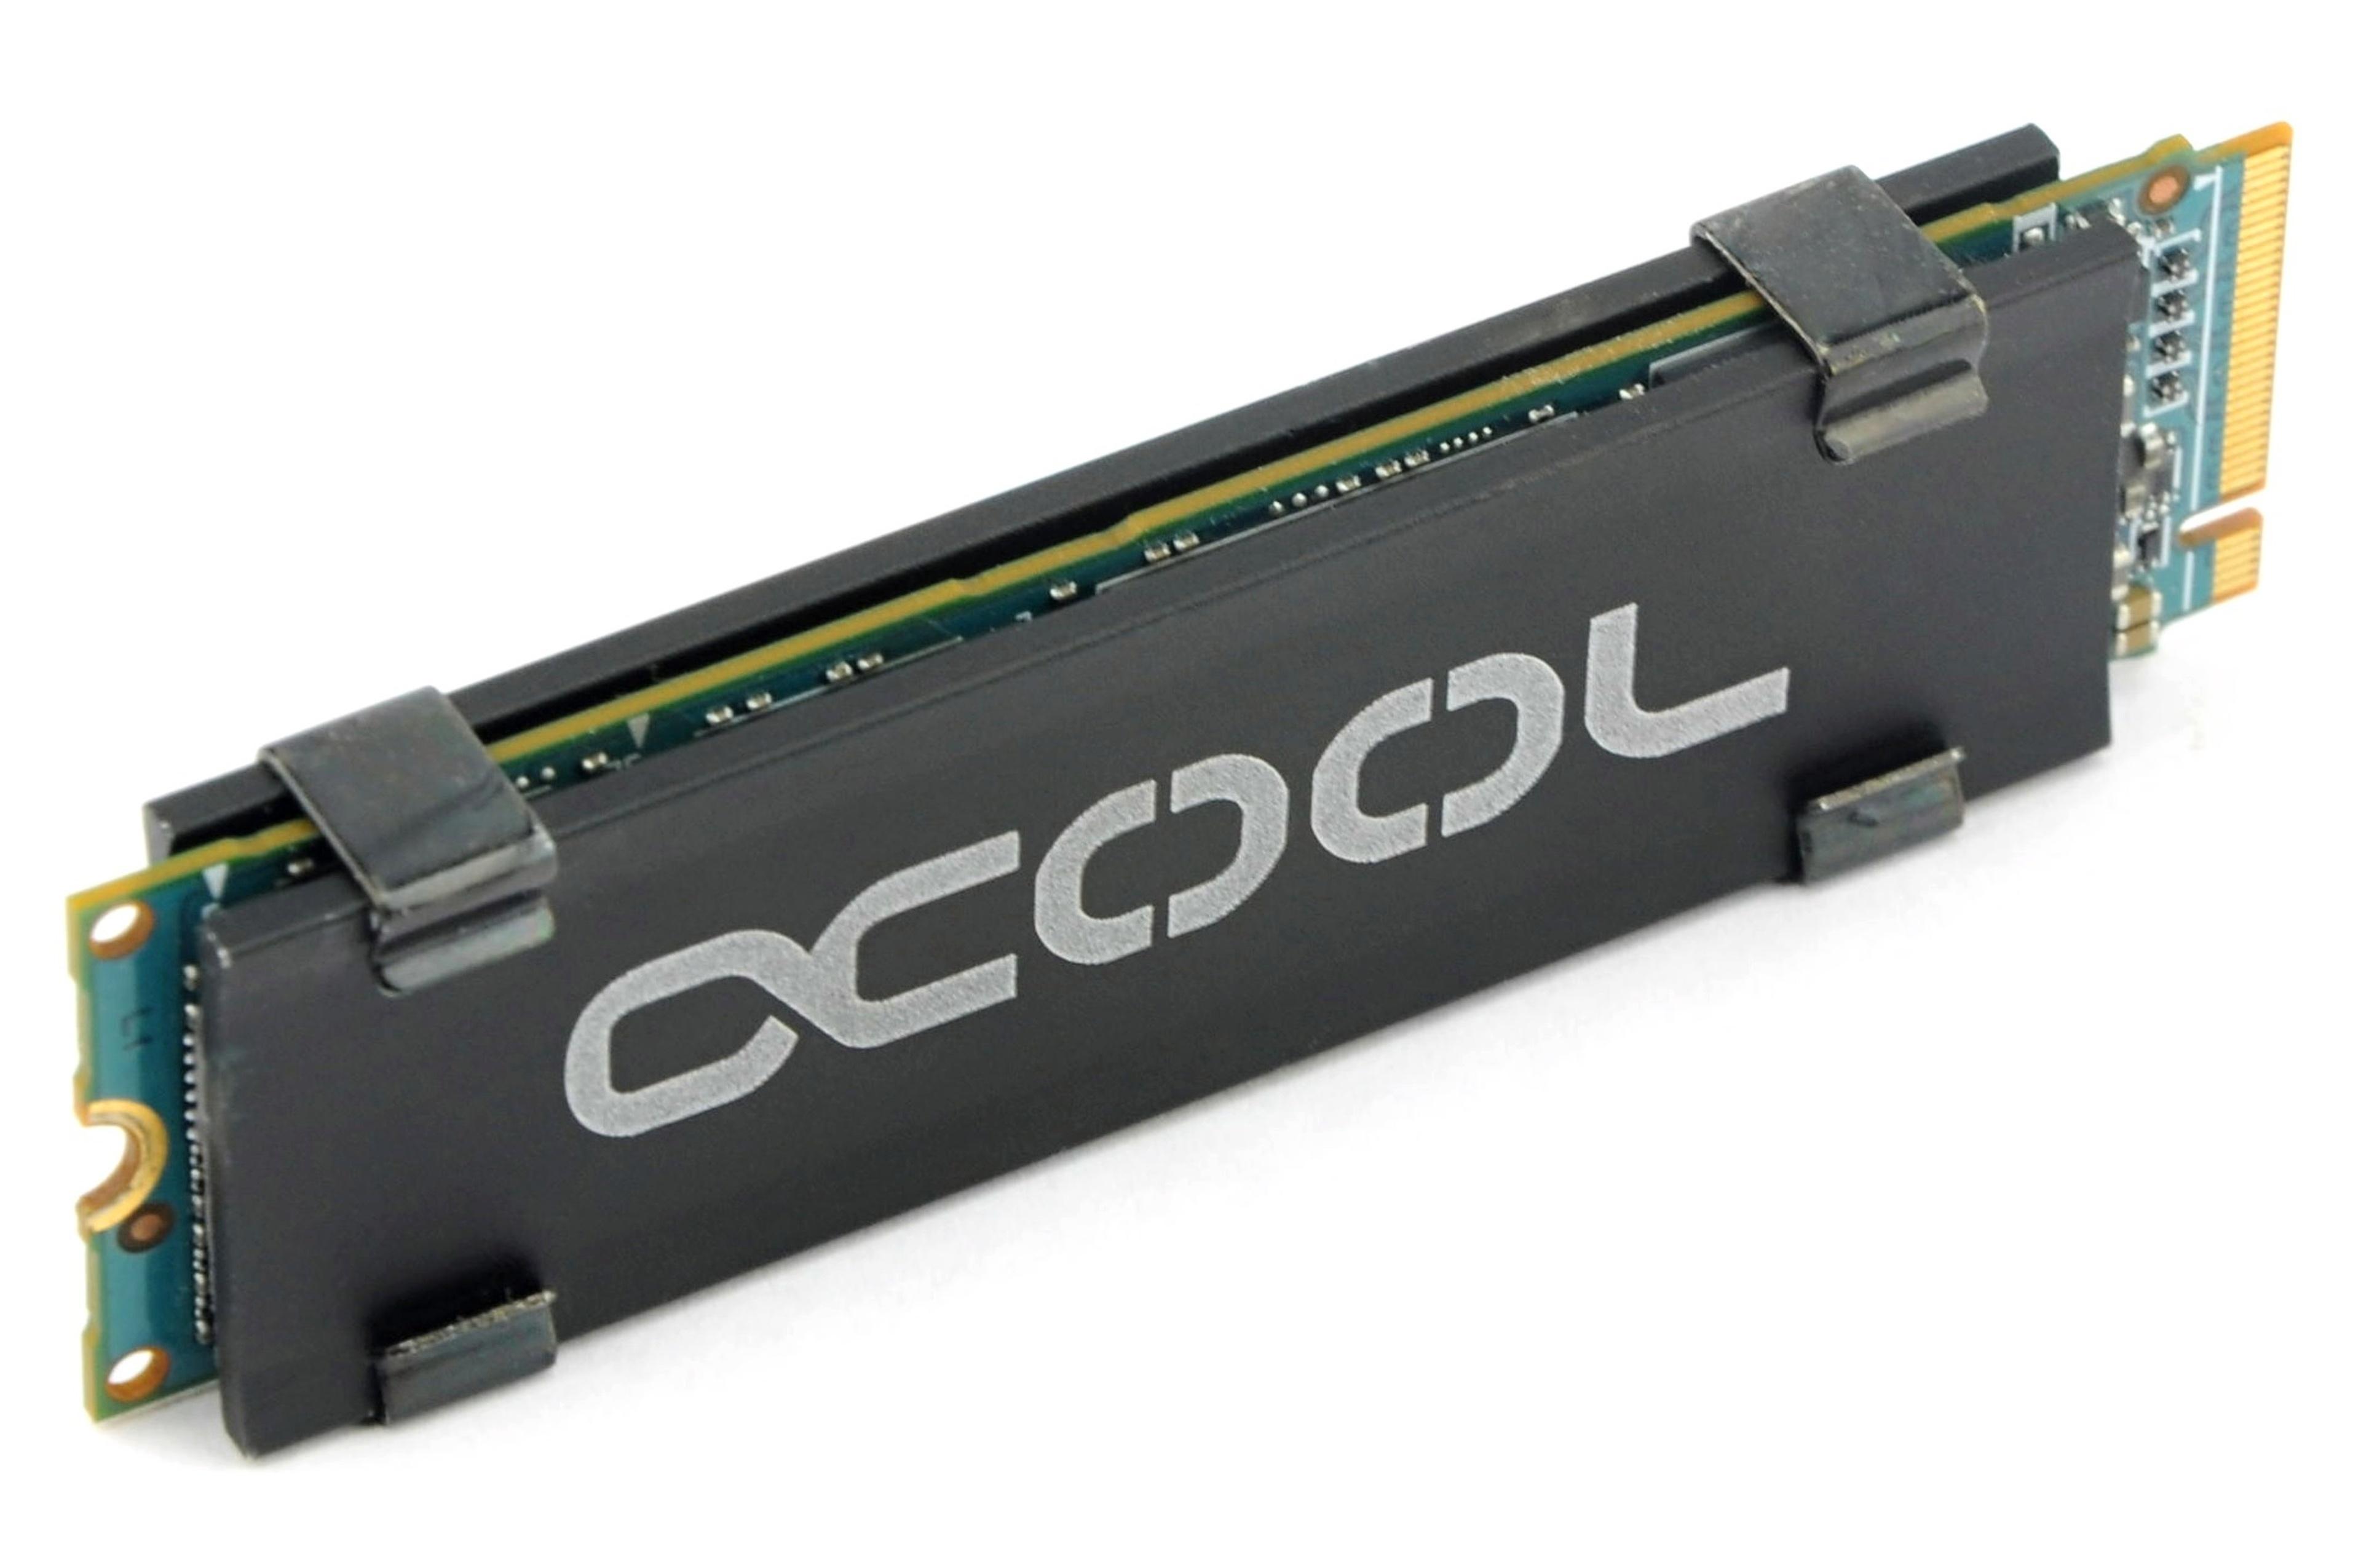 Duel of SSD coolers: Alphacool HDX M 2 vs  EKWB EK-M 2